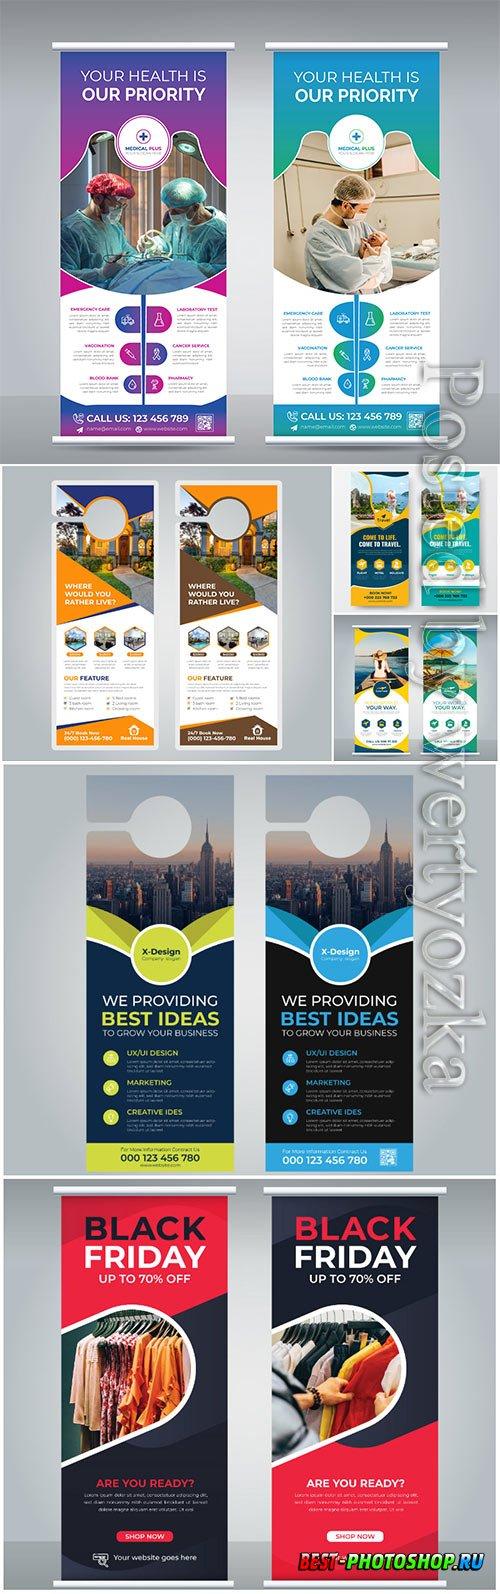 Vector roll up banner design template